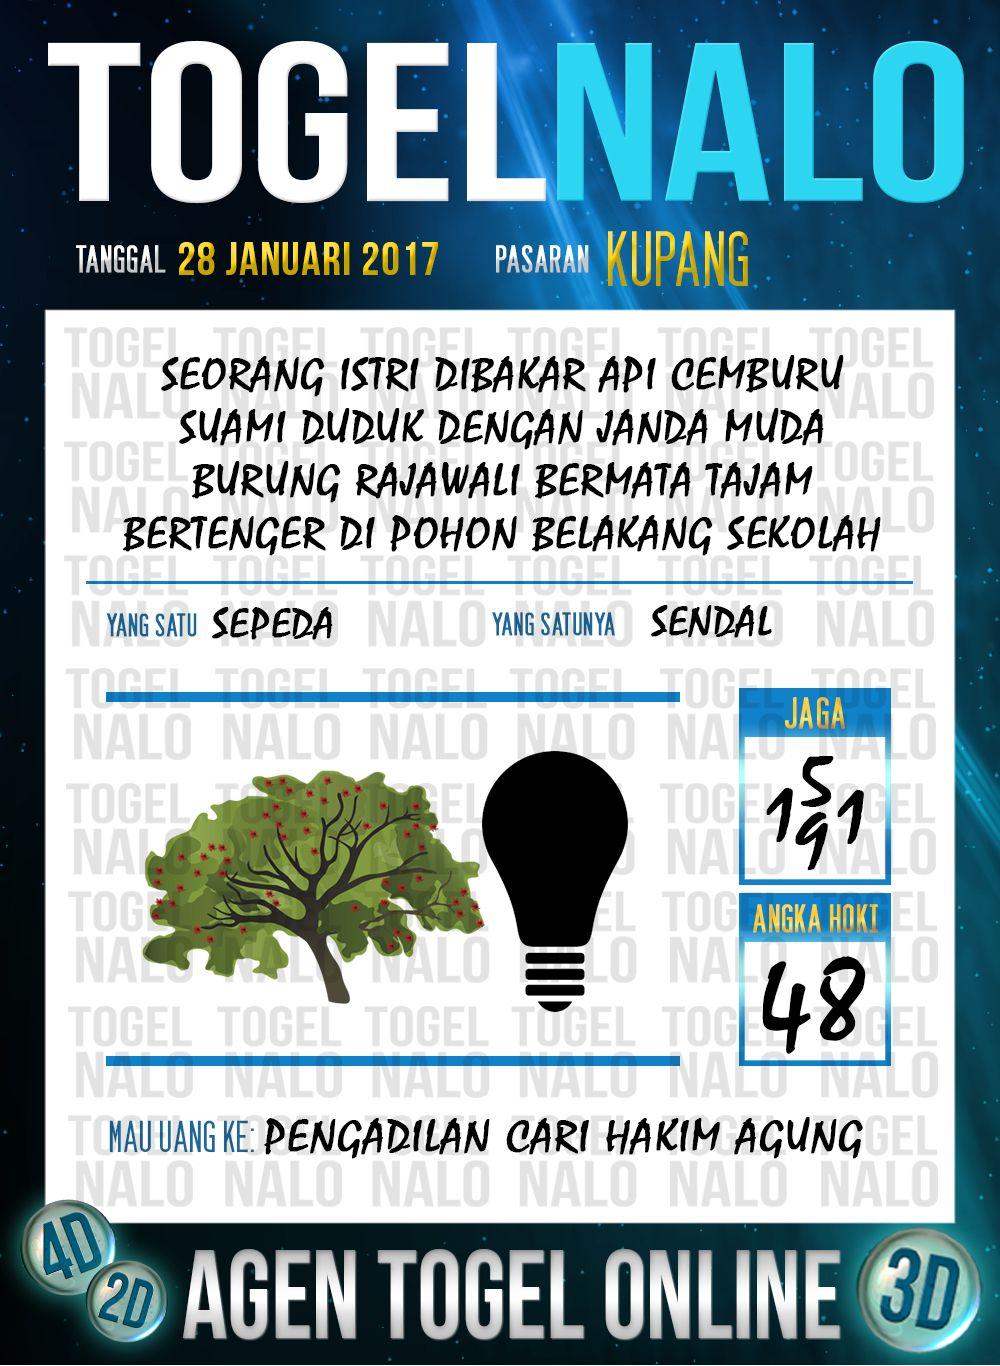 Acak Kodal 2d Togel Wap Online Live Draw 4d Togelnalo Kupang 28 Januari 2017 28 Januari 16 September September